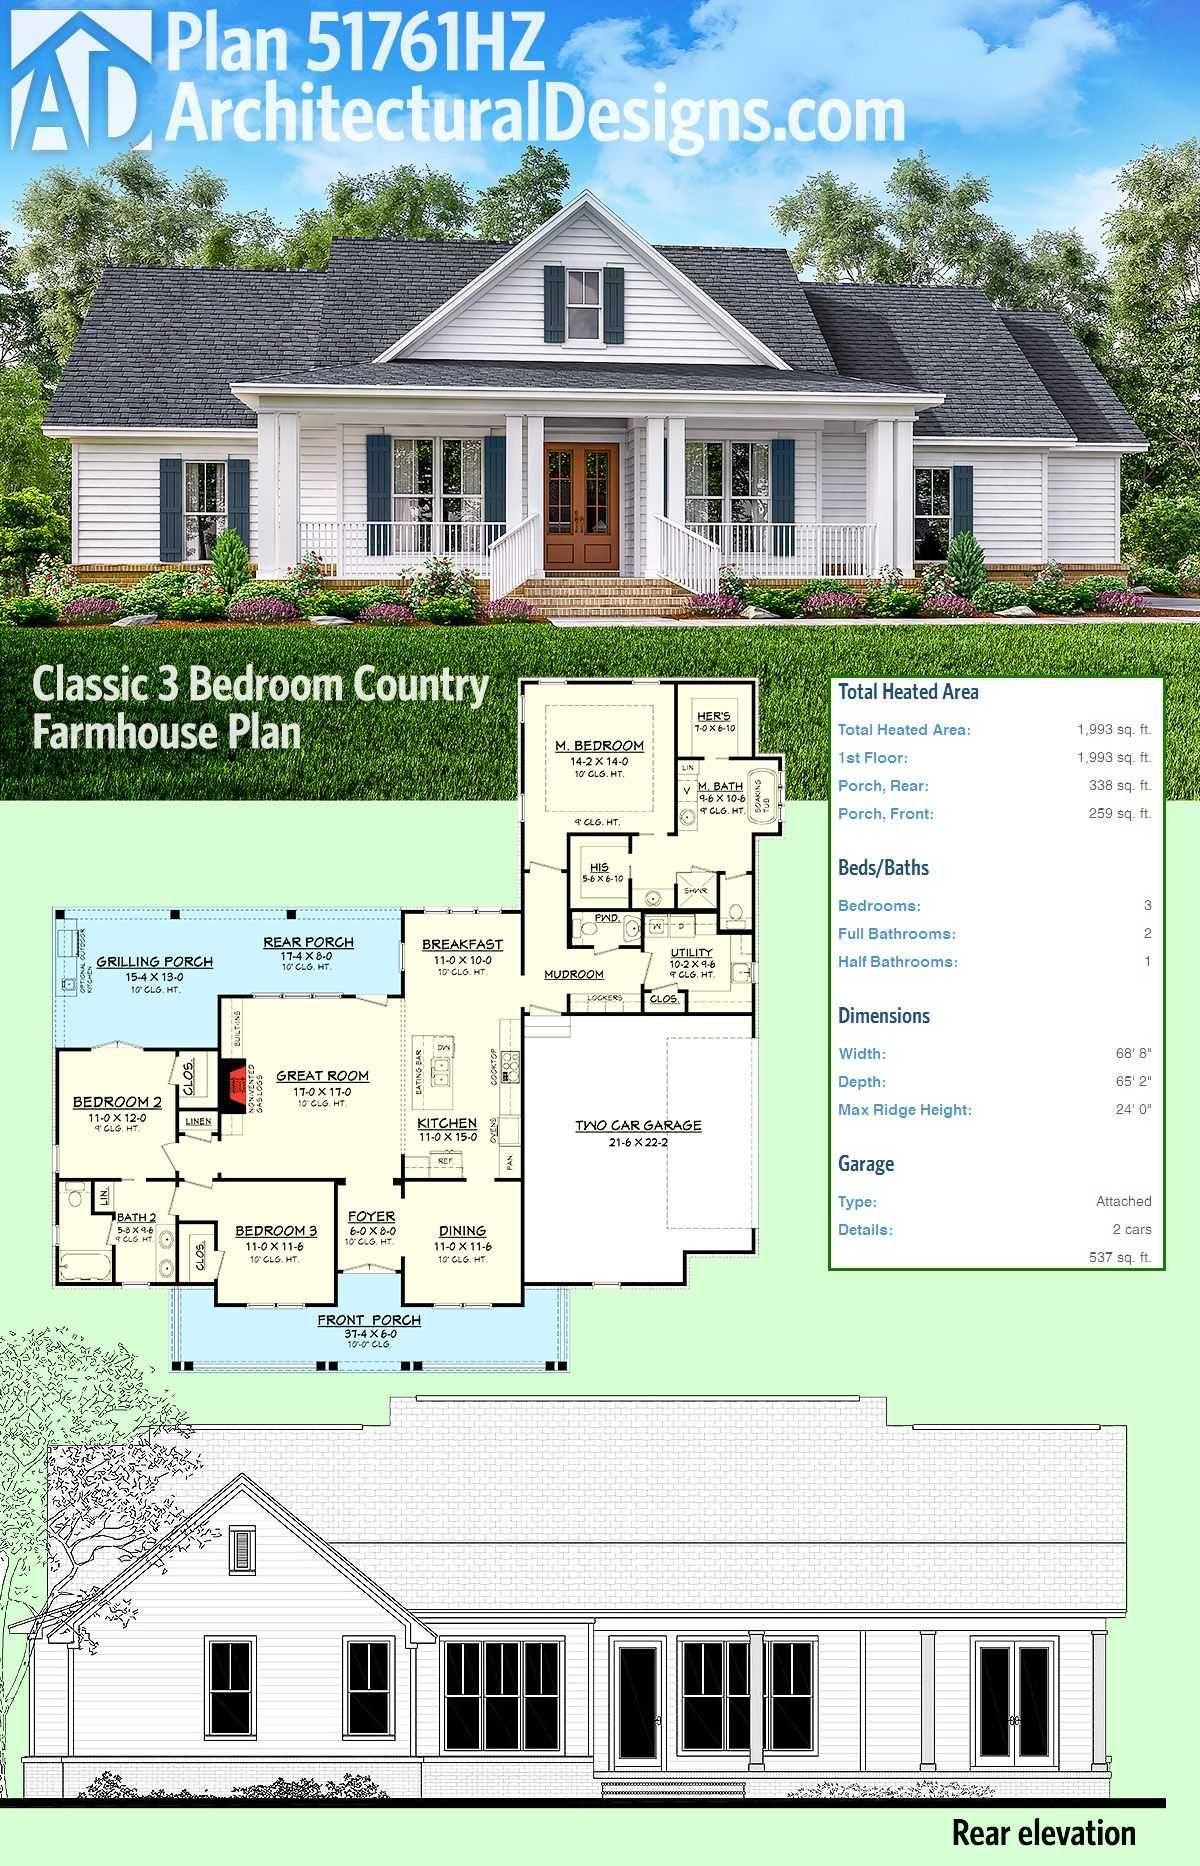 Single Story Farmhouse Plan Inspirational Single Story Farmhouse Plan Introducing Ar Architectural Design House Plans House Plans Farmhouse Farmhouse Plans